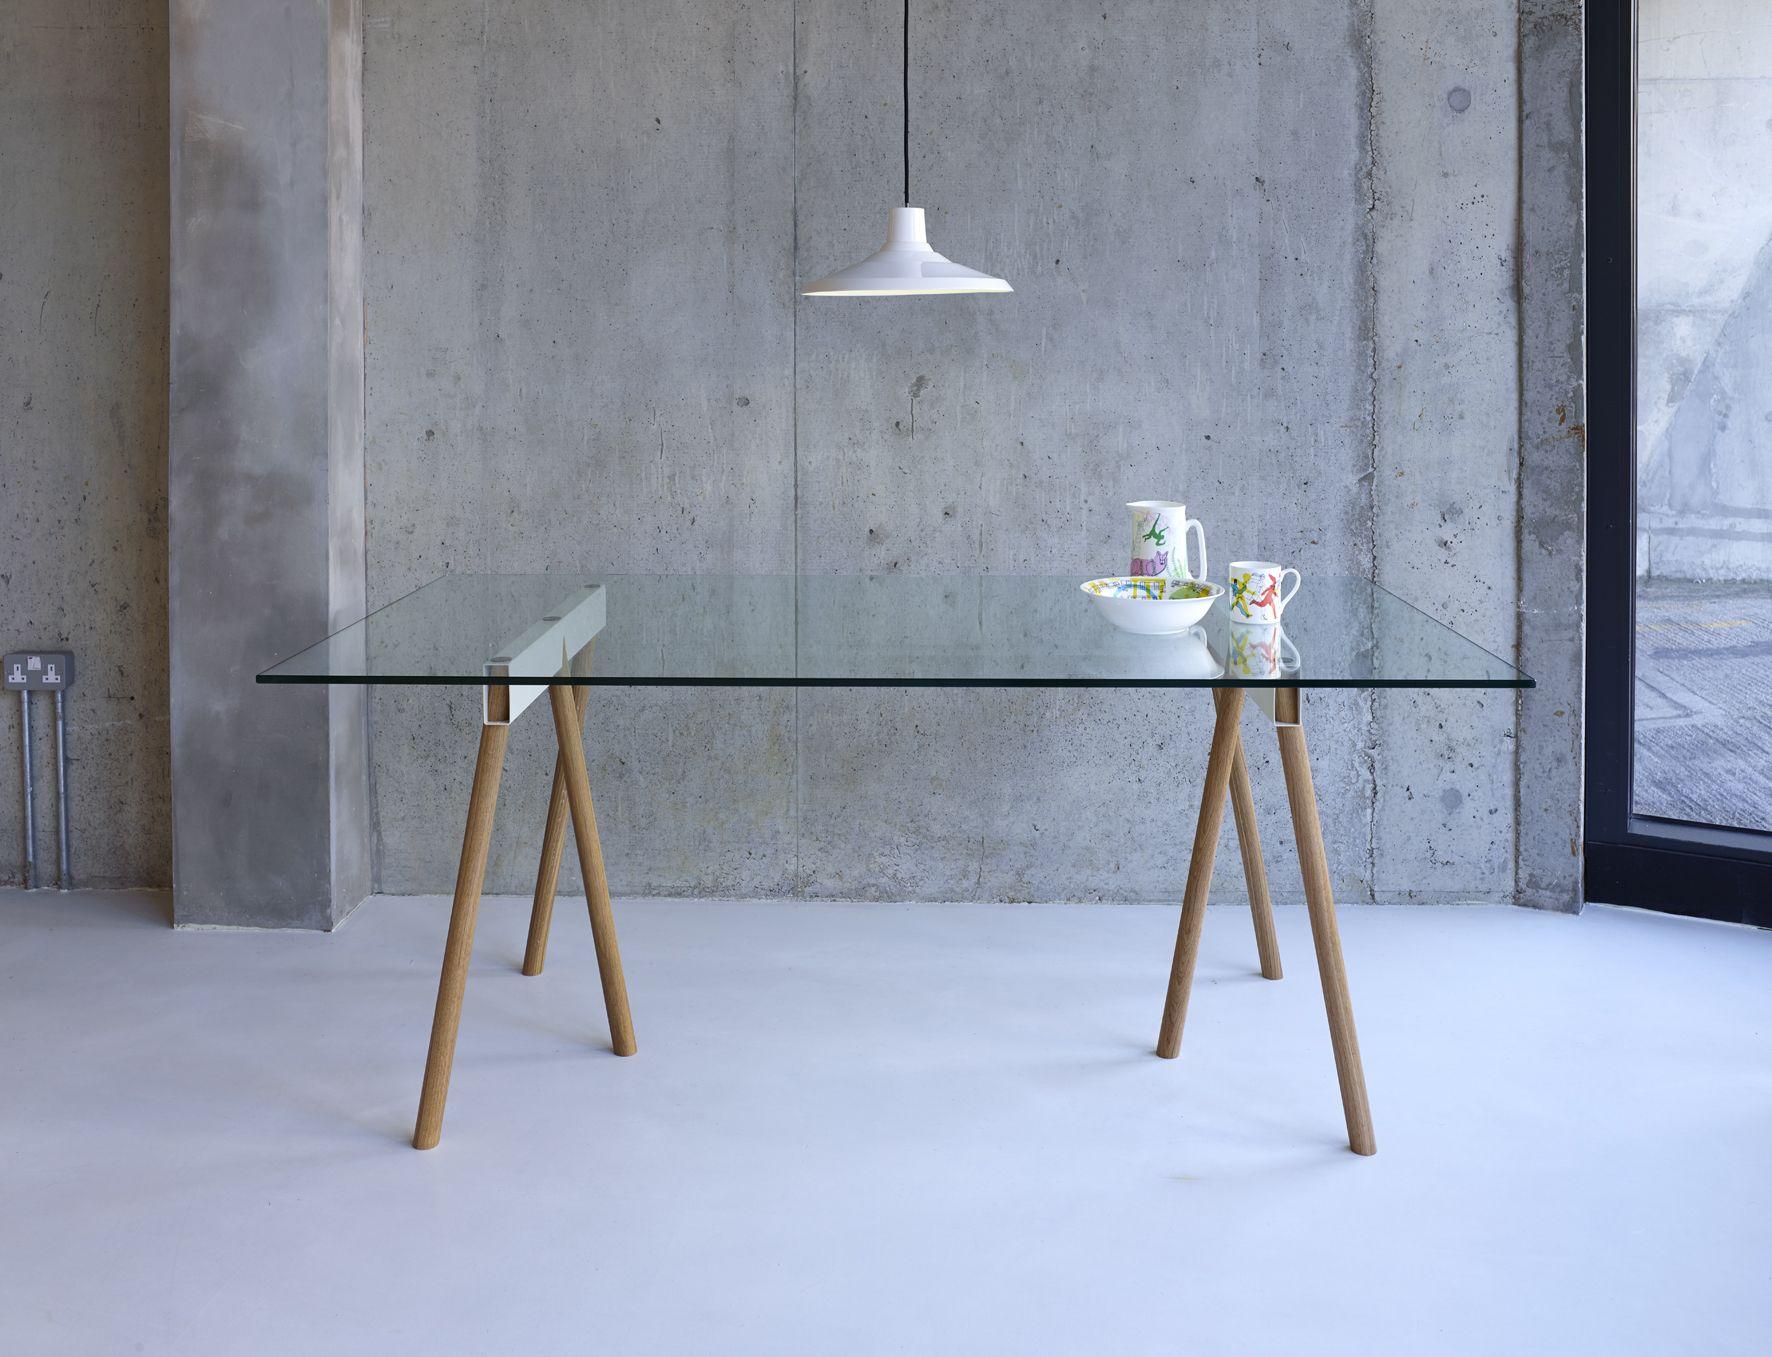 Crosscut table Faudet-Harrison | SCP | Office desks | Pinterest ...